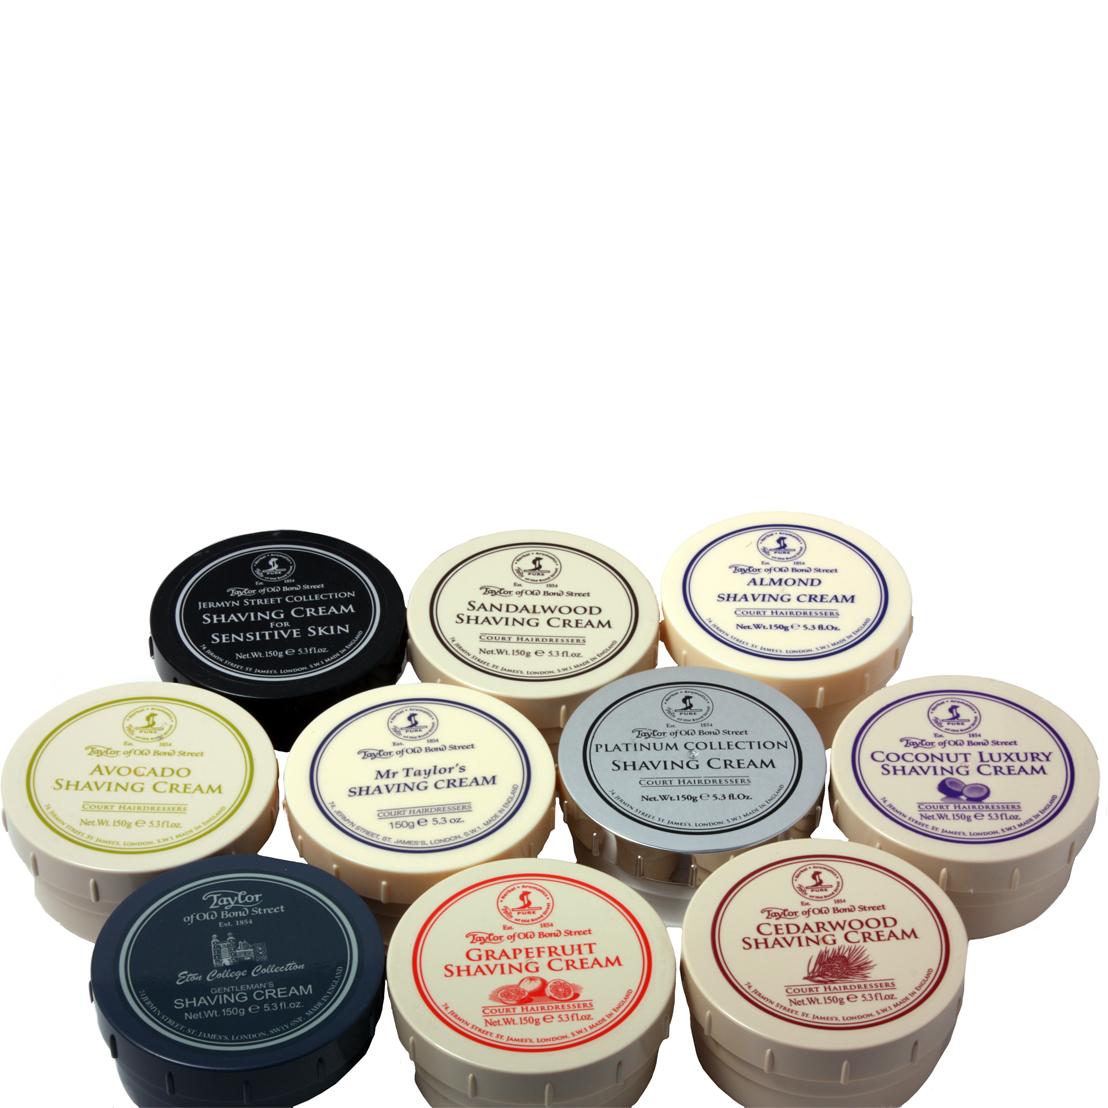 Taylor of old bond street luxury shaving cream